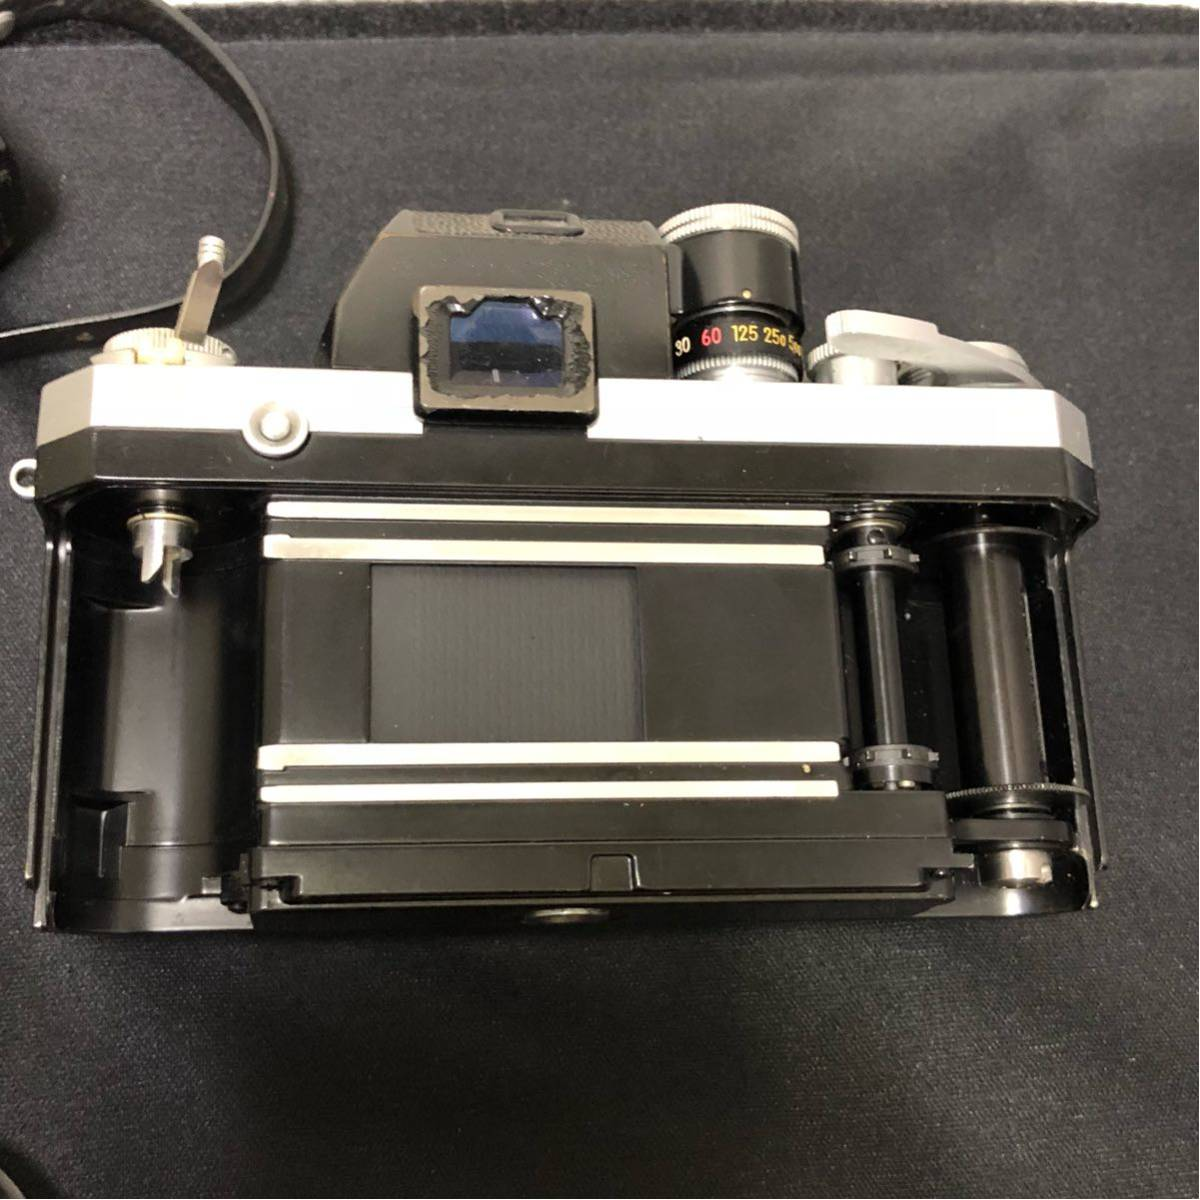 ♯ NIKON ニコン 一眼レフ カメラ F nikkor-ud 1:3.5 20mm nikkor 50mm 1:1.2 レンズ2本セット_画像5